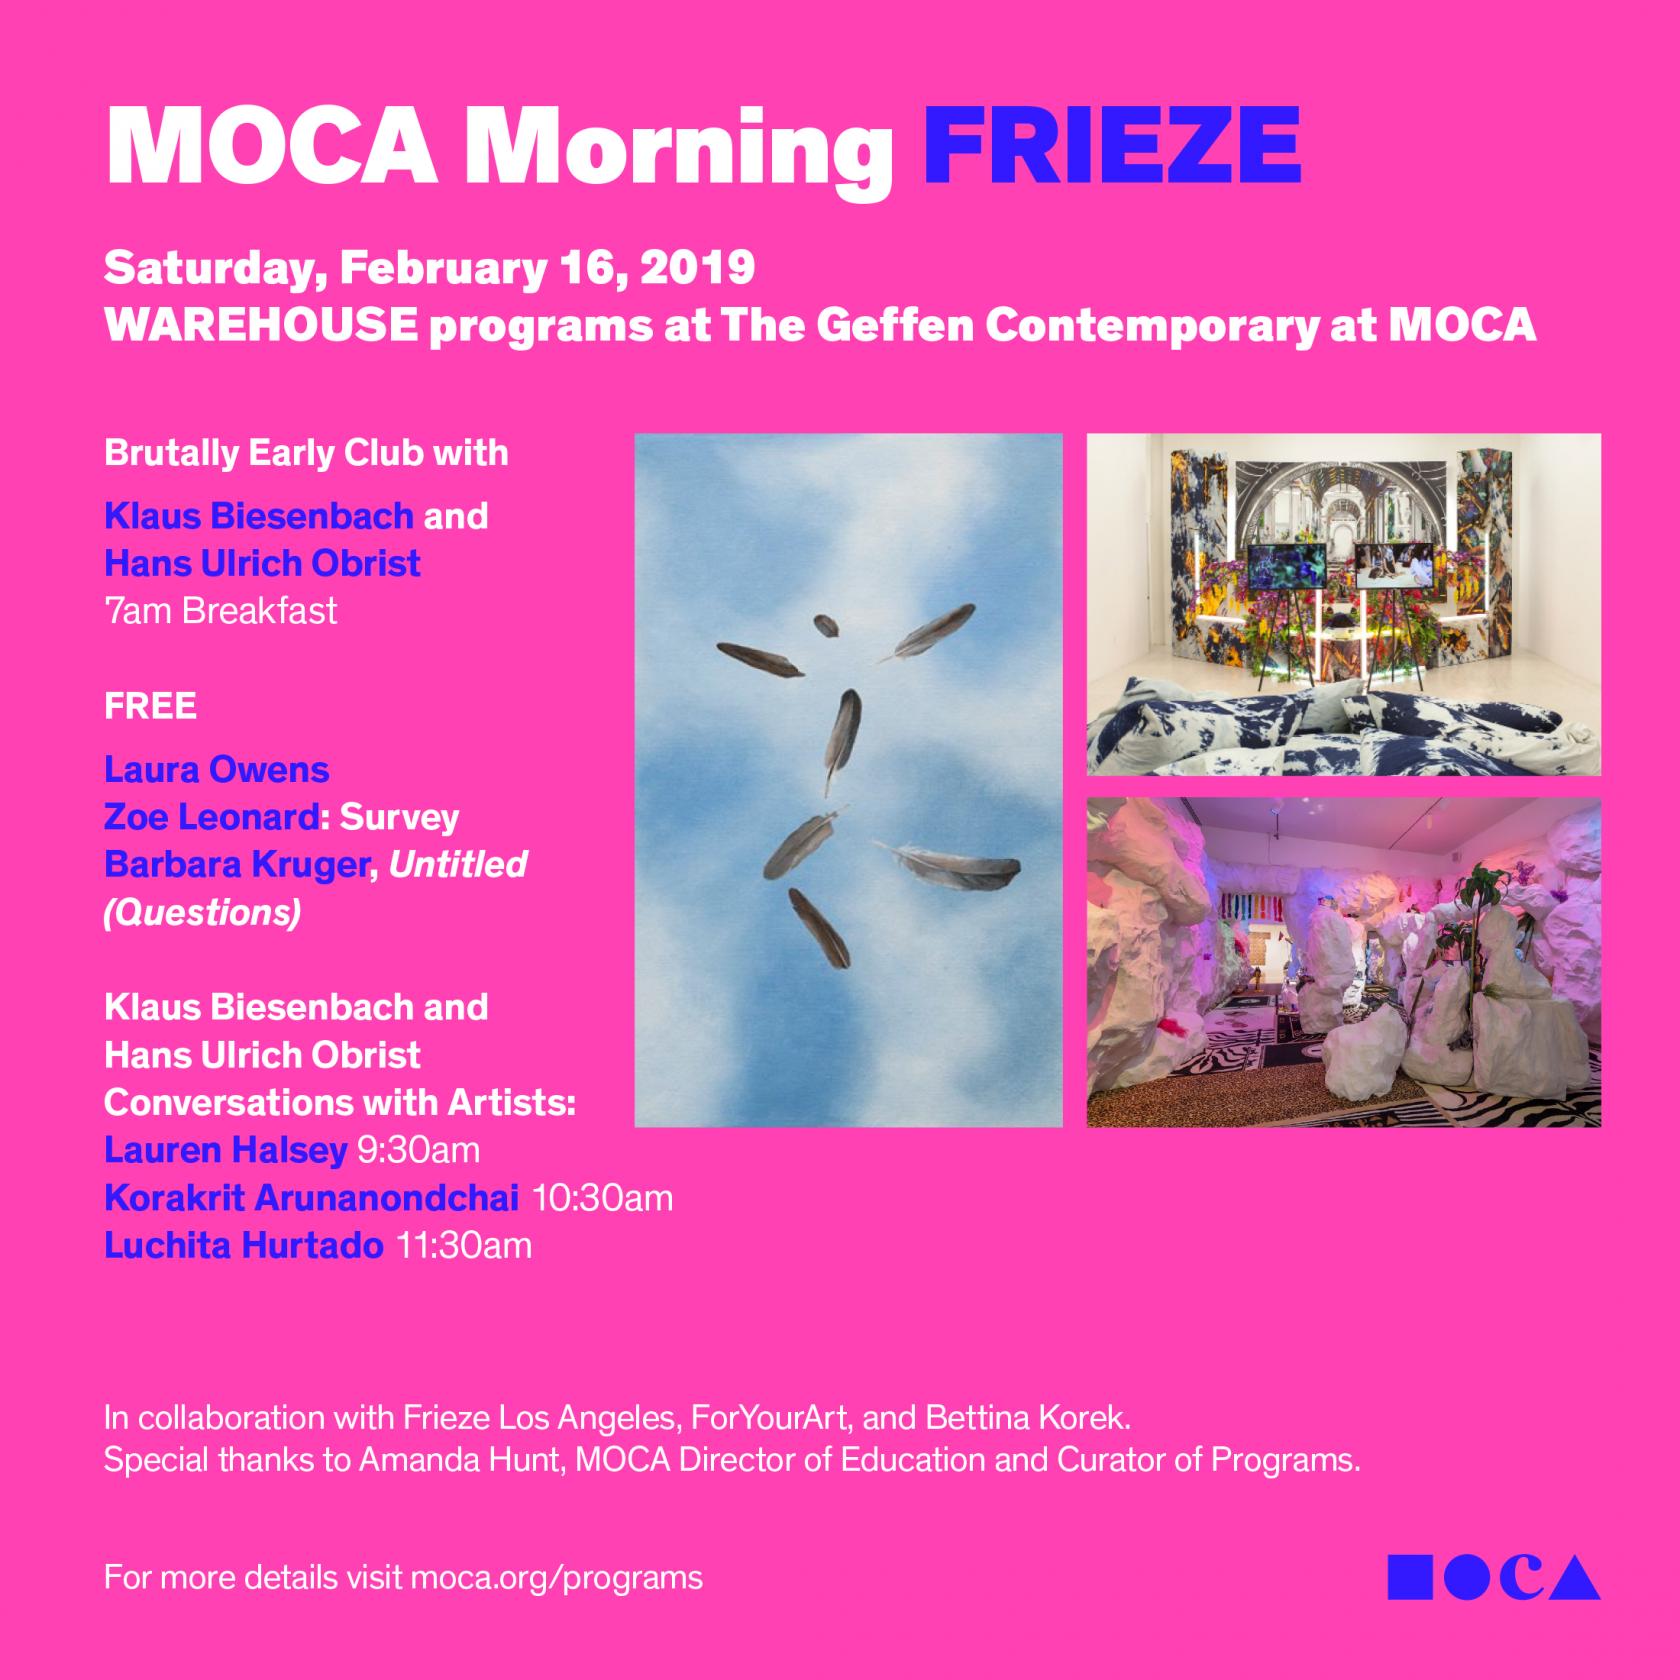 MOCA Morning FRIEZE